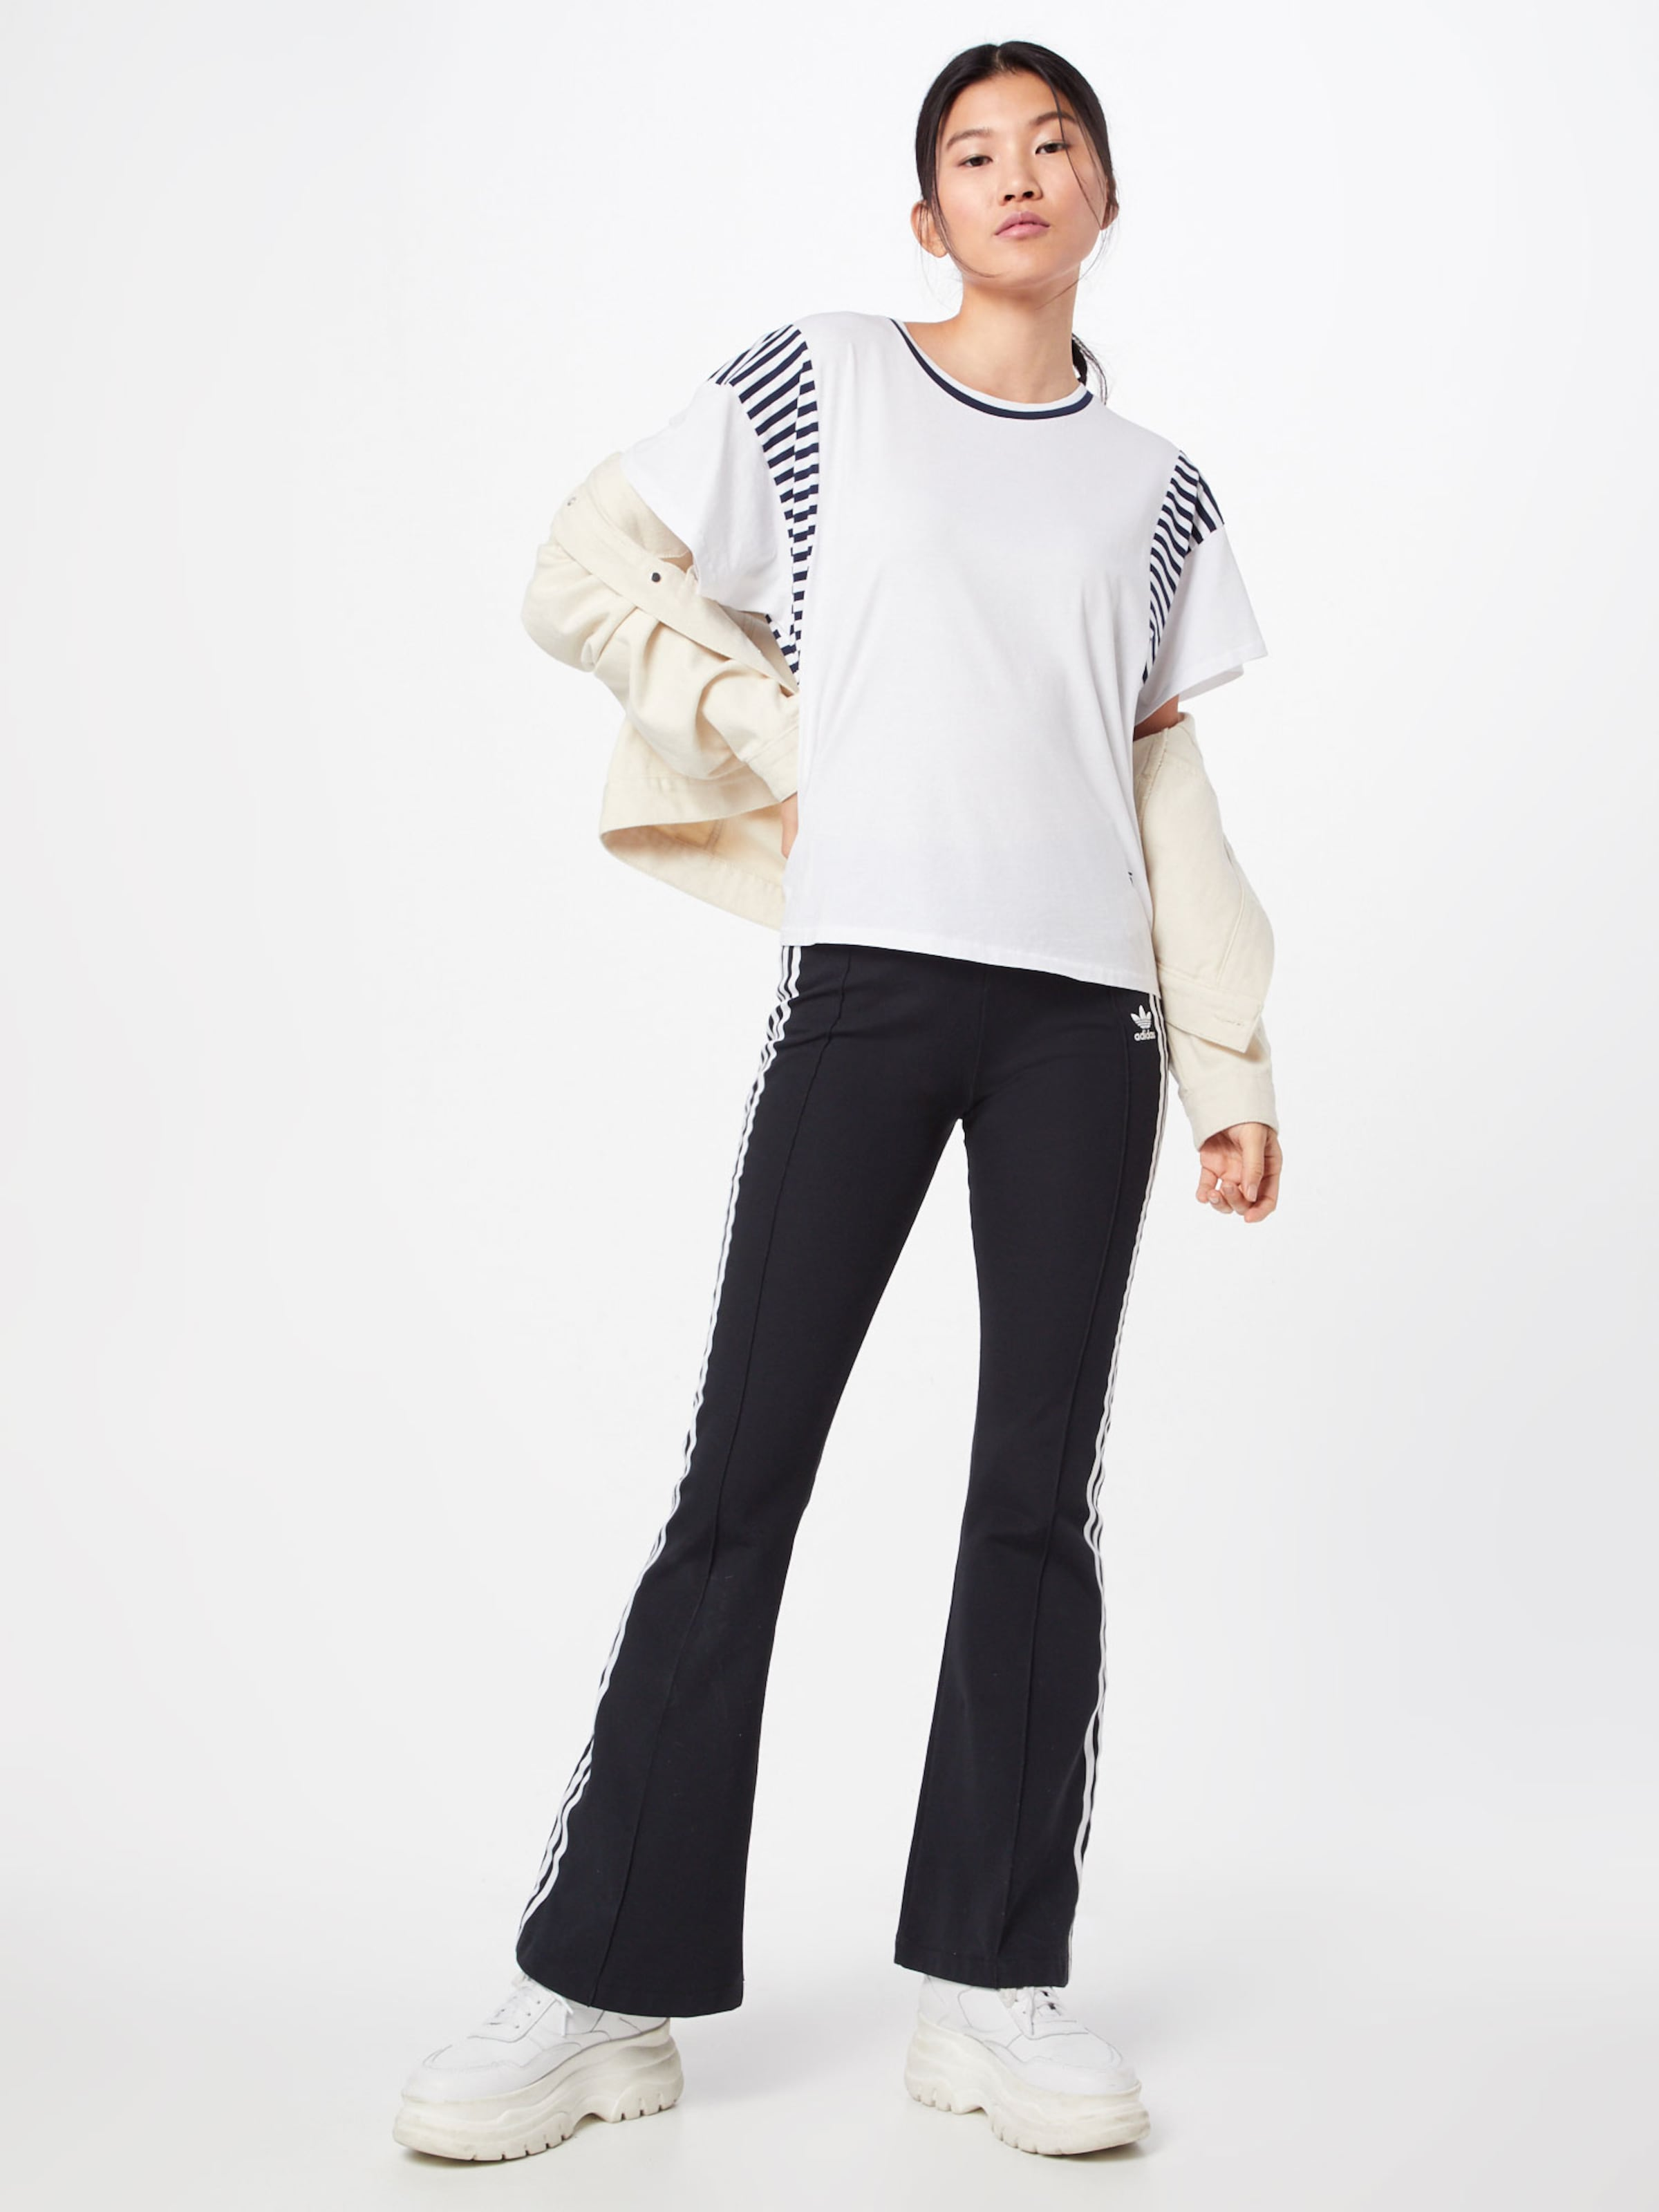 Loose' In T NavyWeiß shirt Raw G star 'norcia T3uFclK1J5